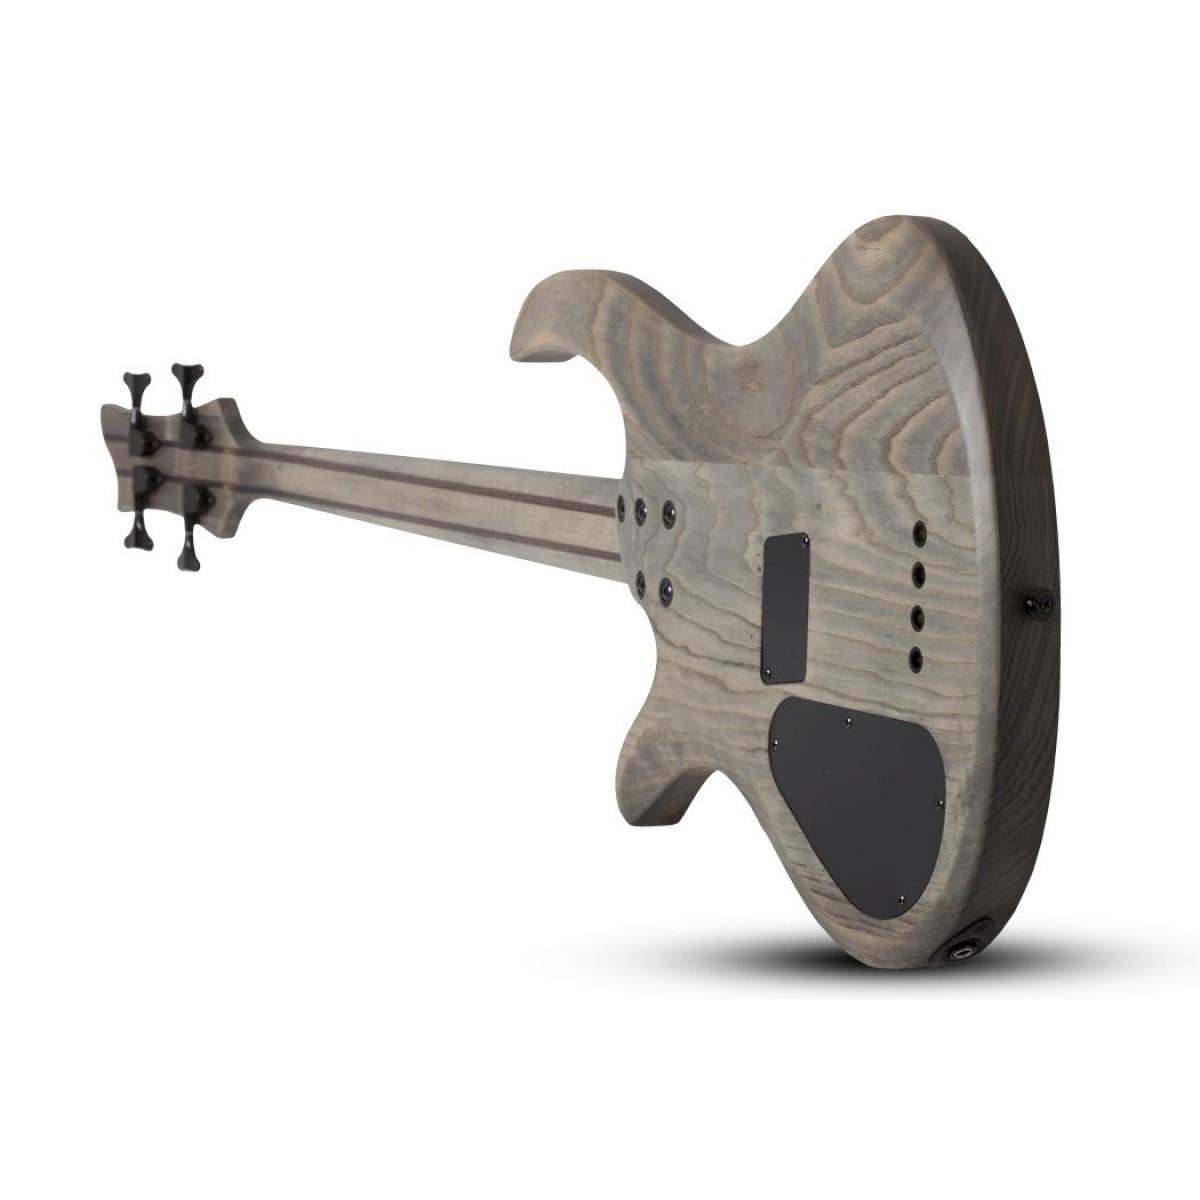 schecter sch1450 riot 4 sarb bass guitar. Black Bedroom Furniture Sets. Home Design Ideas